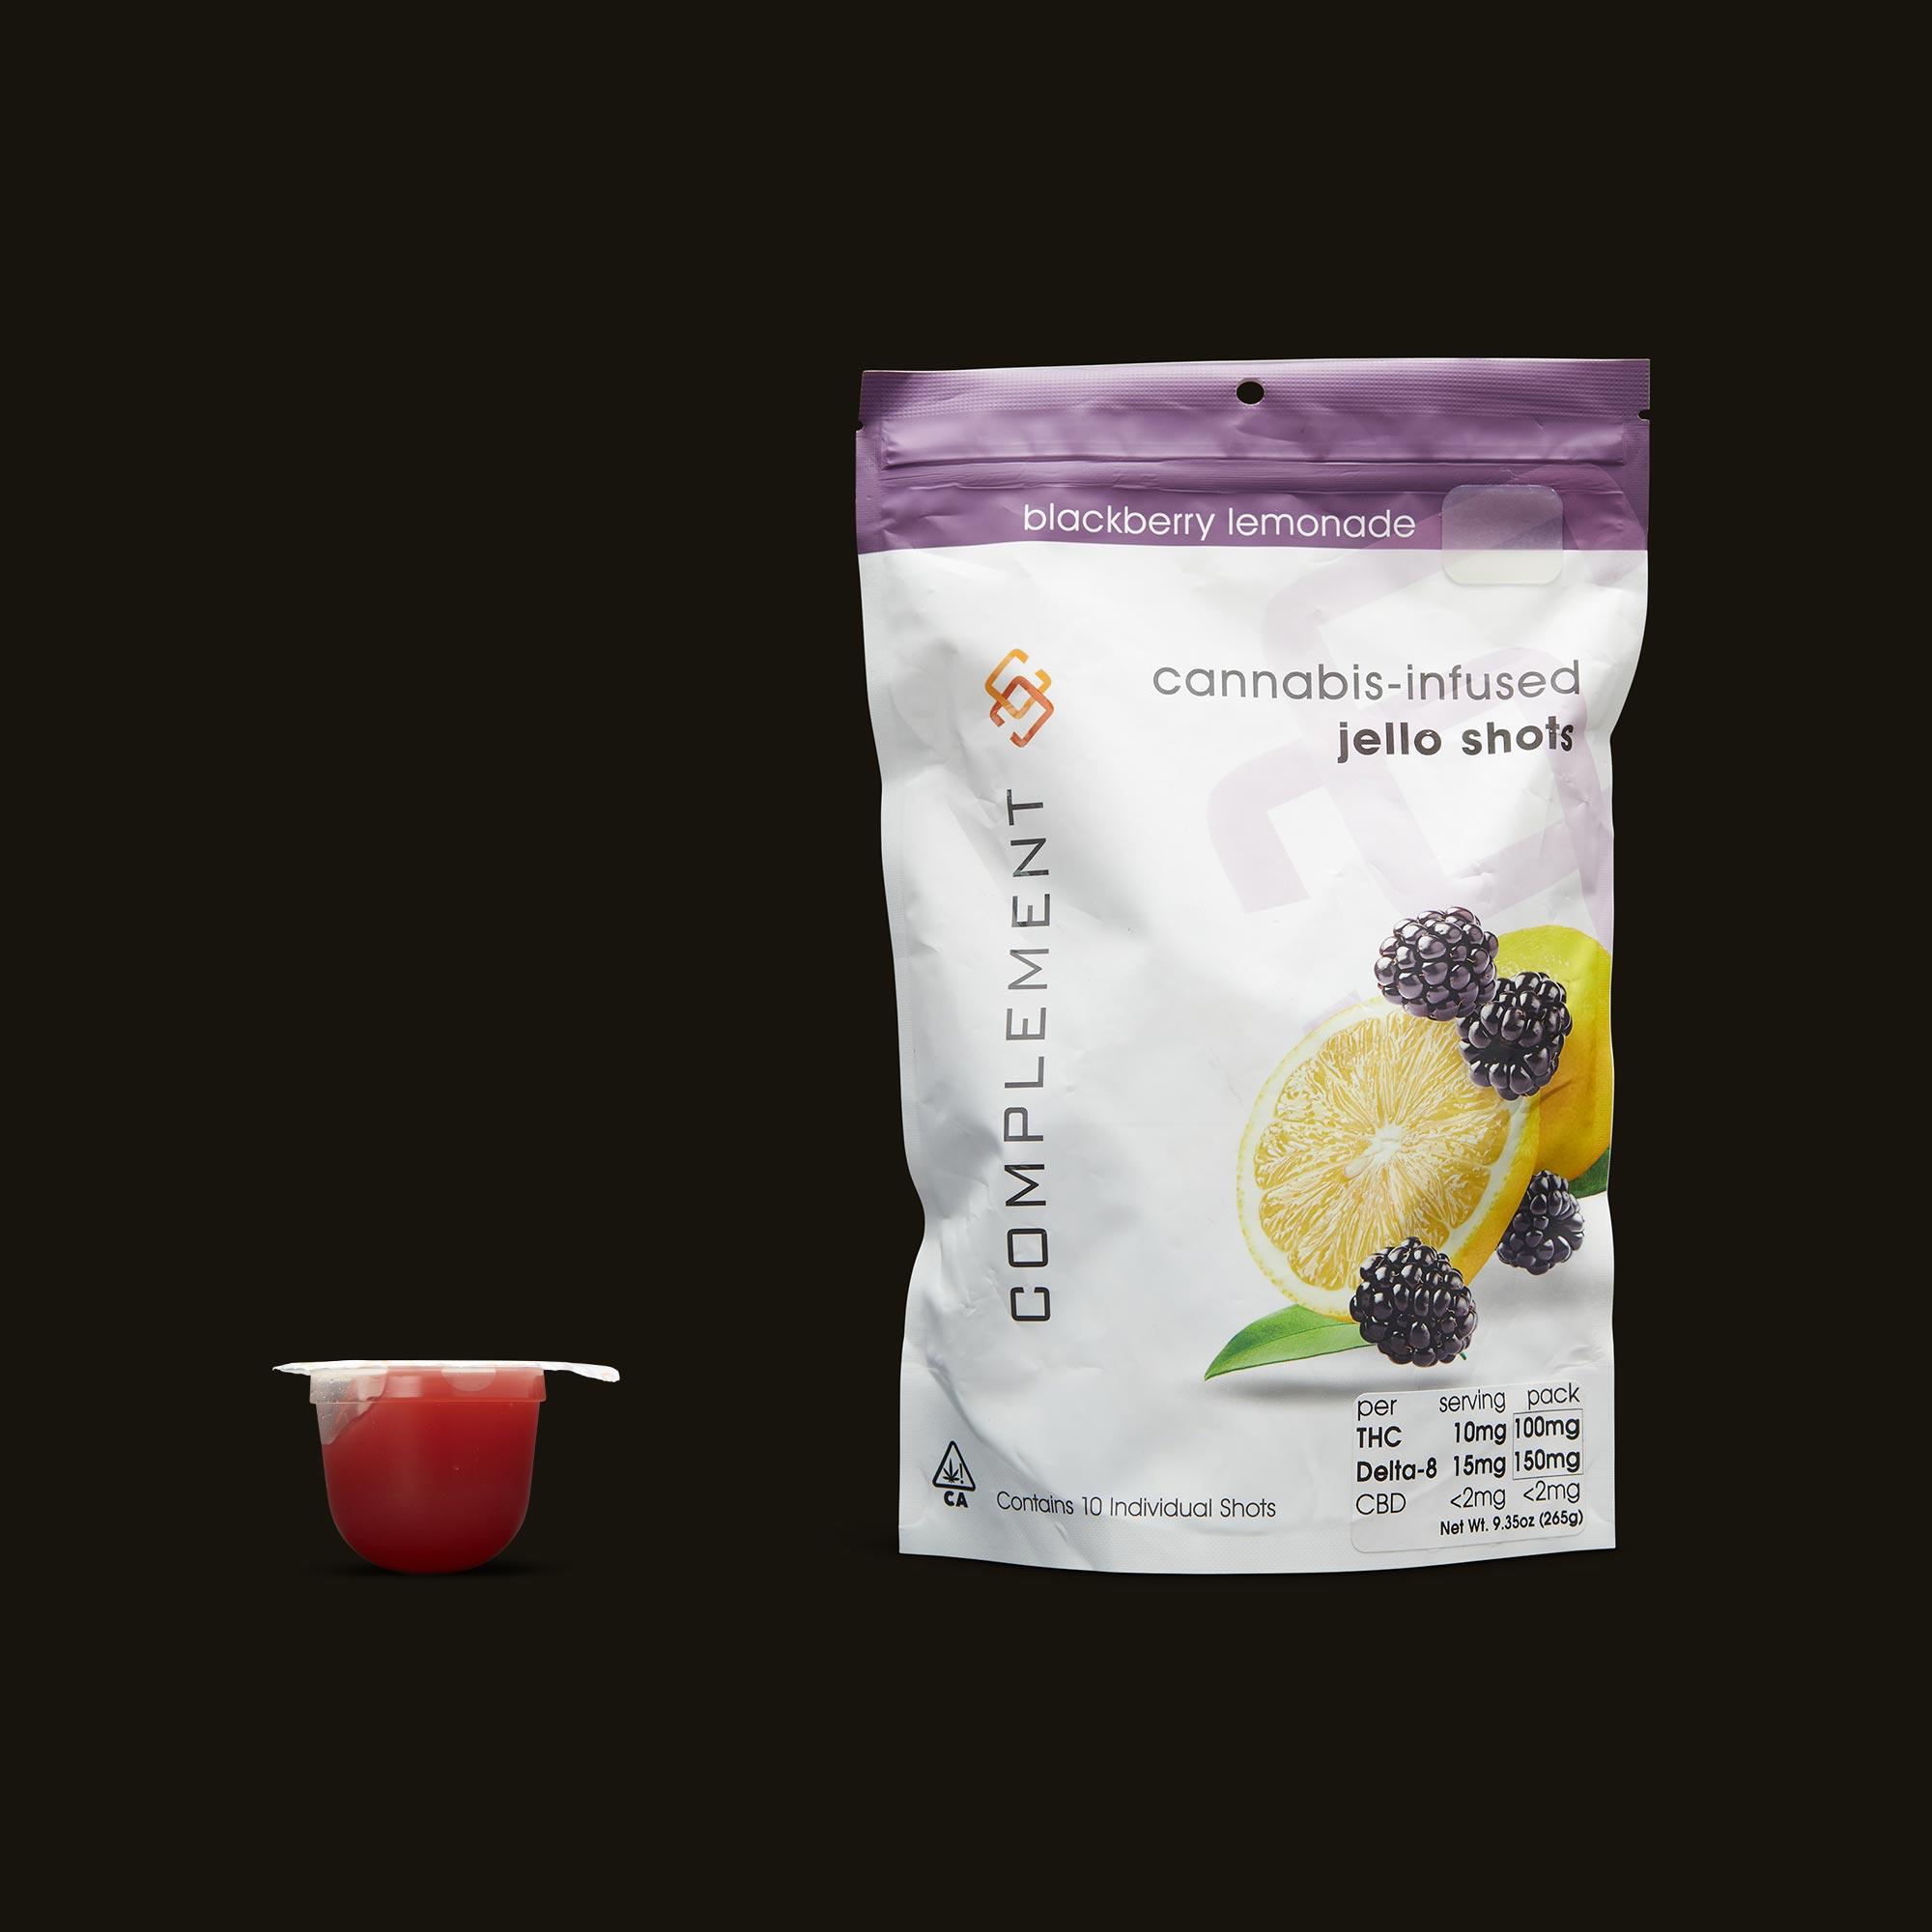 Complement Blackberry Lemonade Jello Shots